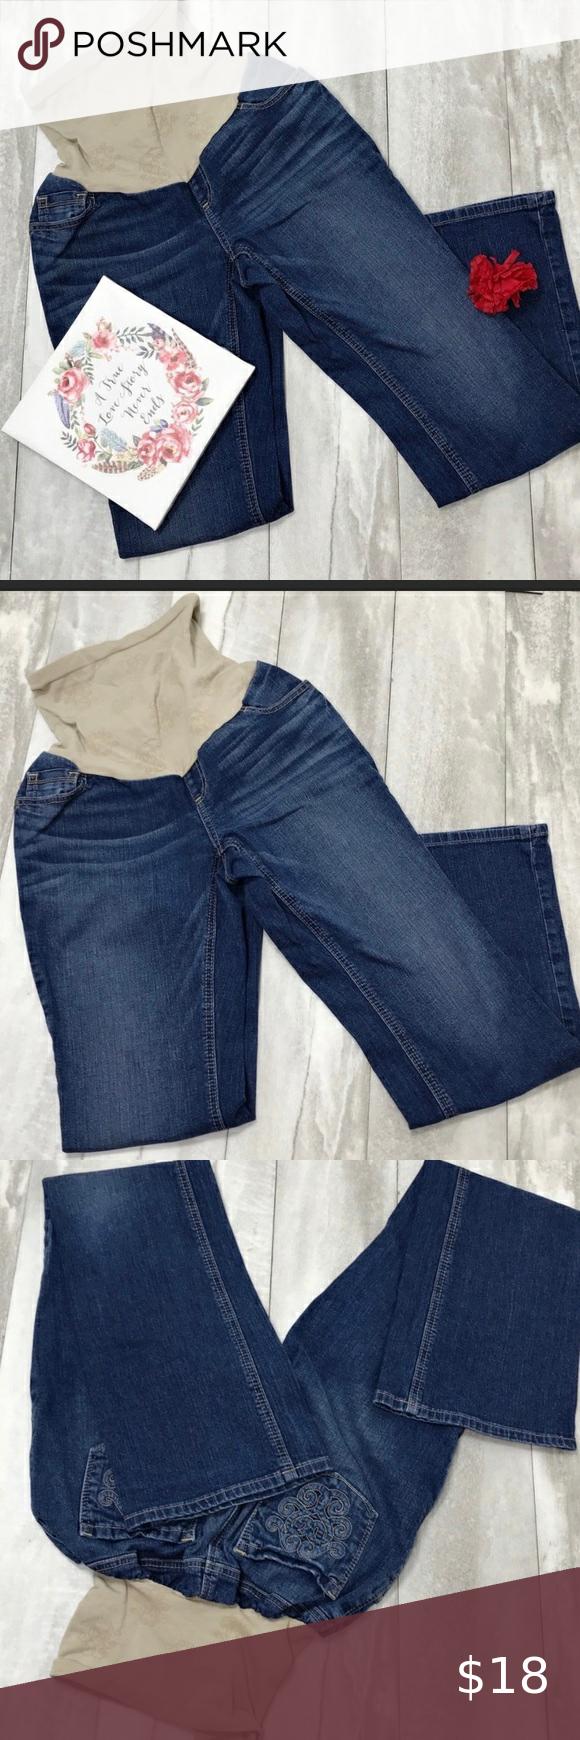 Jessica Simpson Maternity Jeans Size Large Jessica